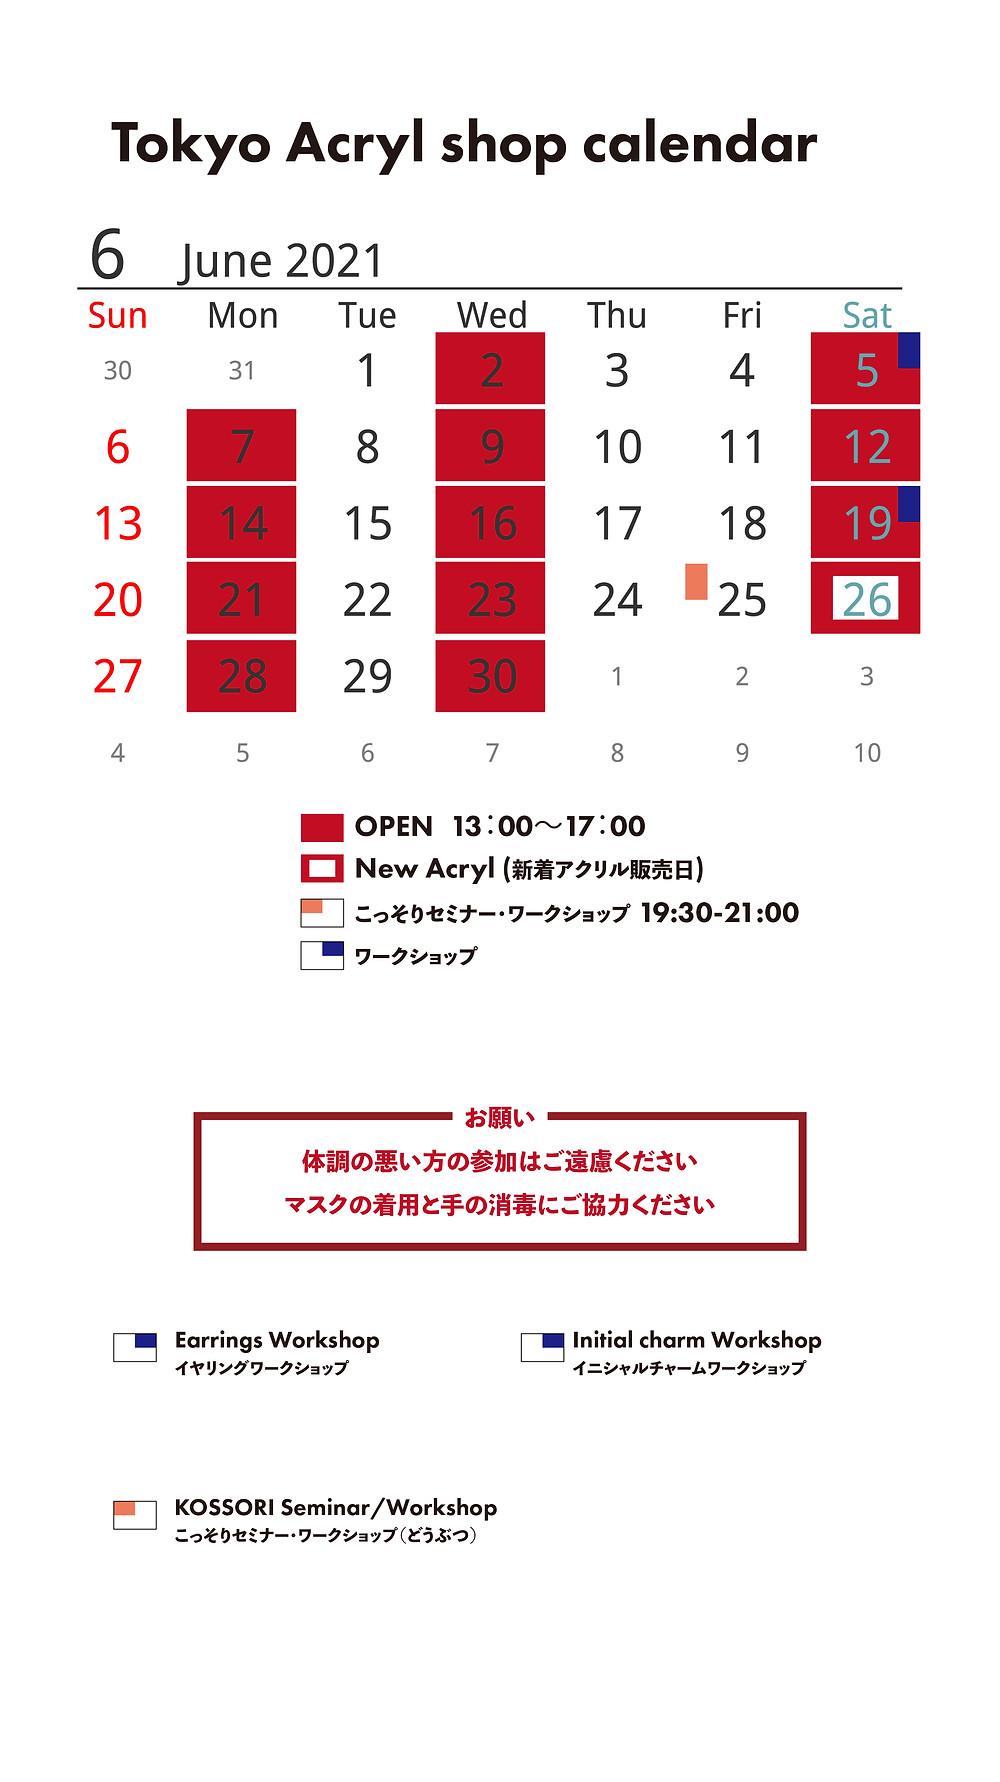 TOKYO ACRYL SHOP 2021JUNEカレンダー 営業日